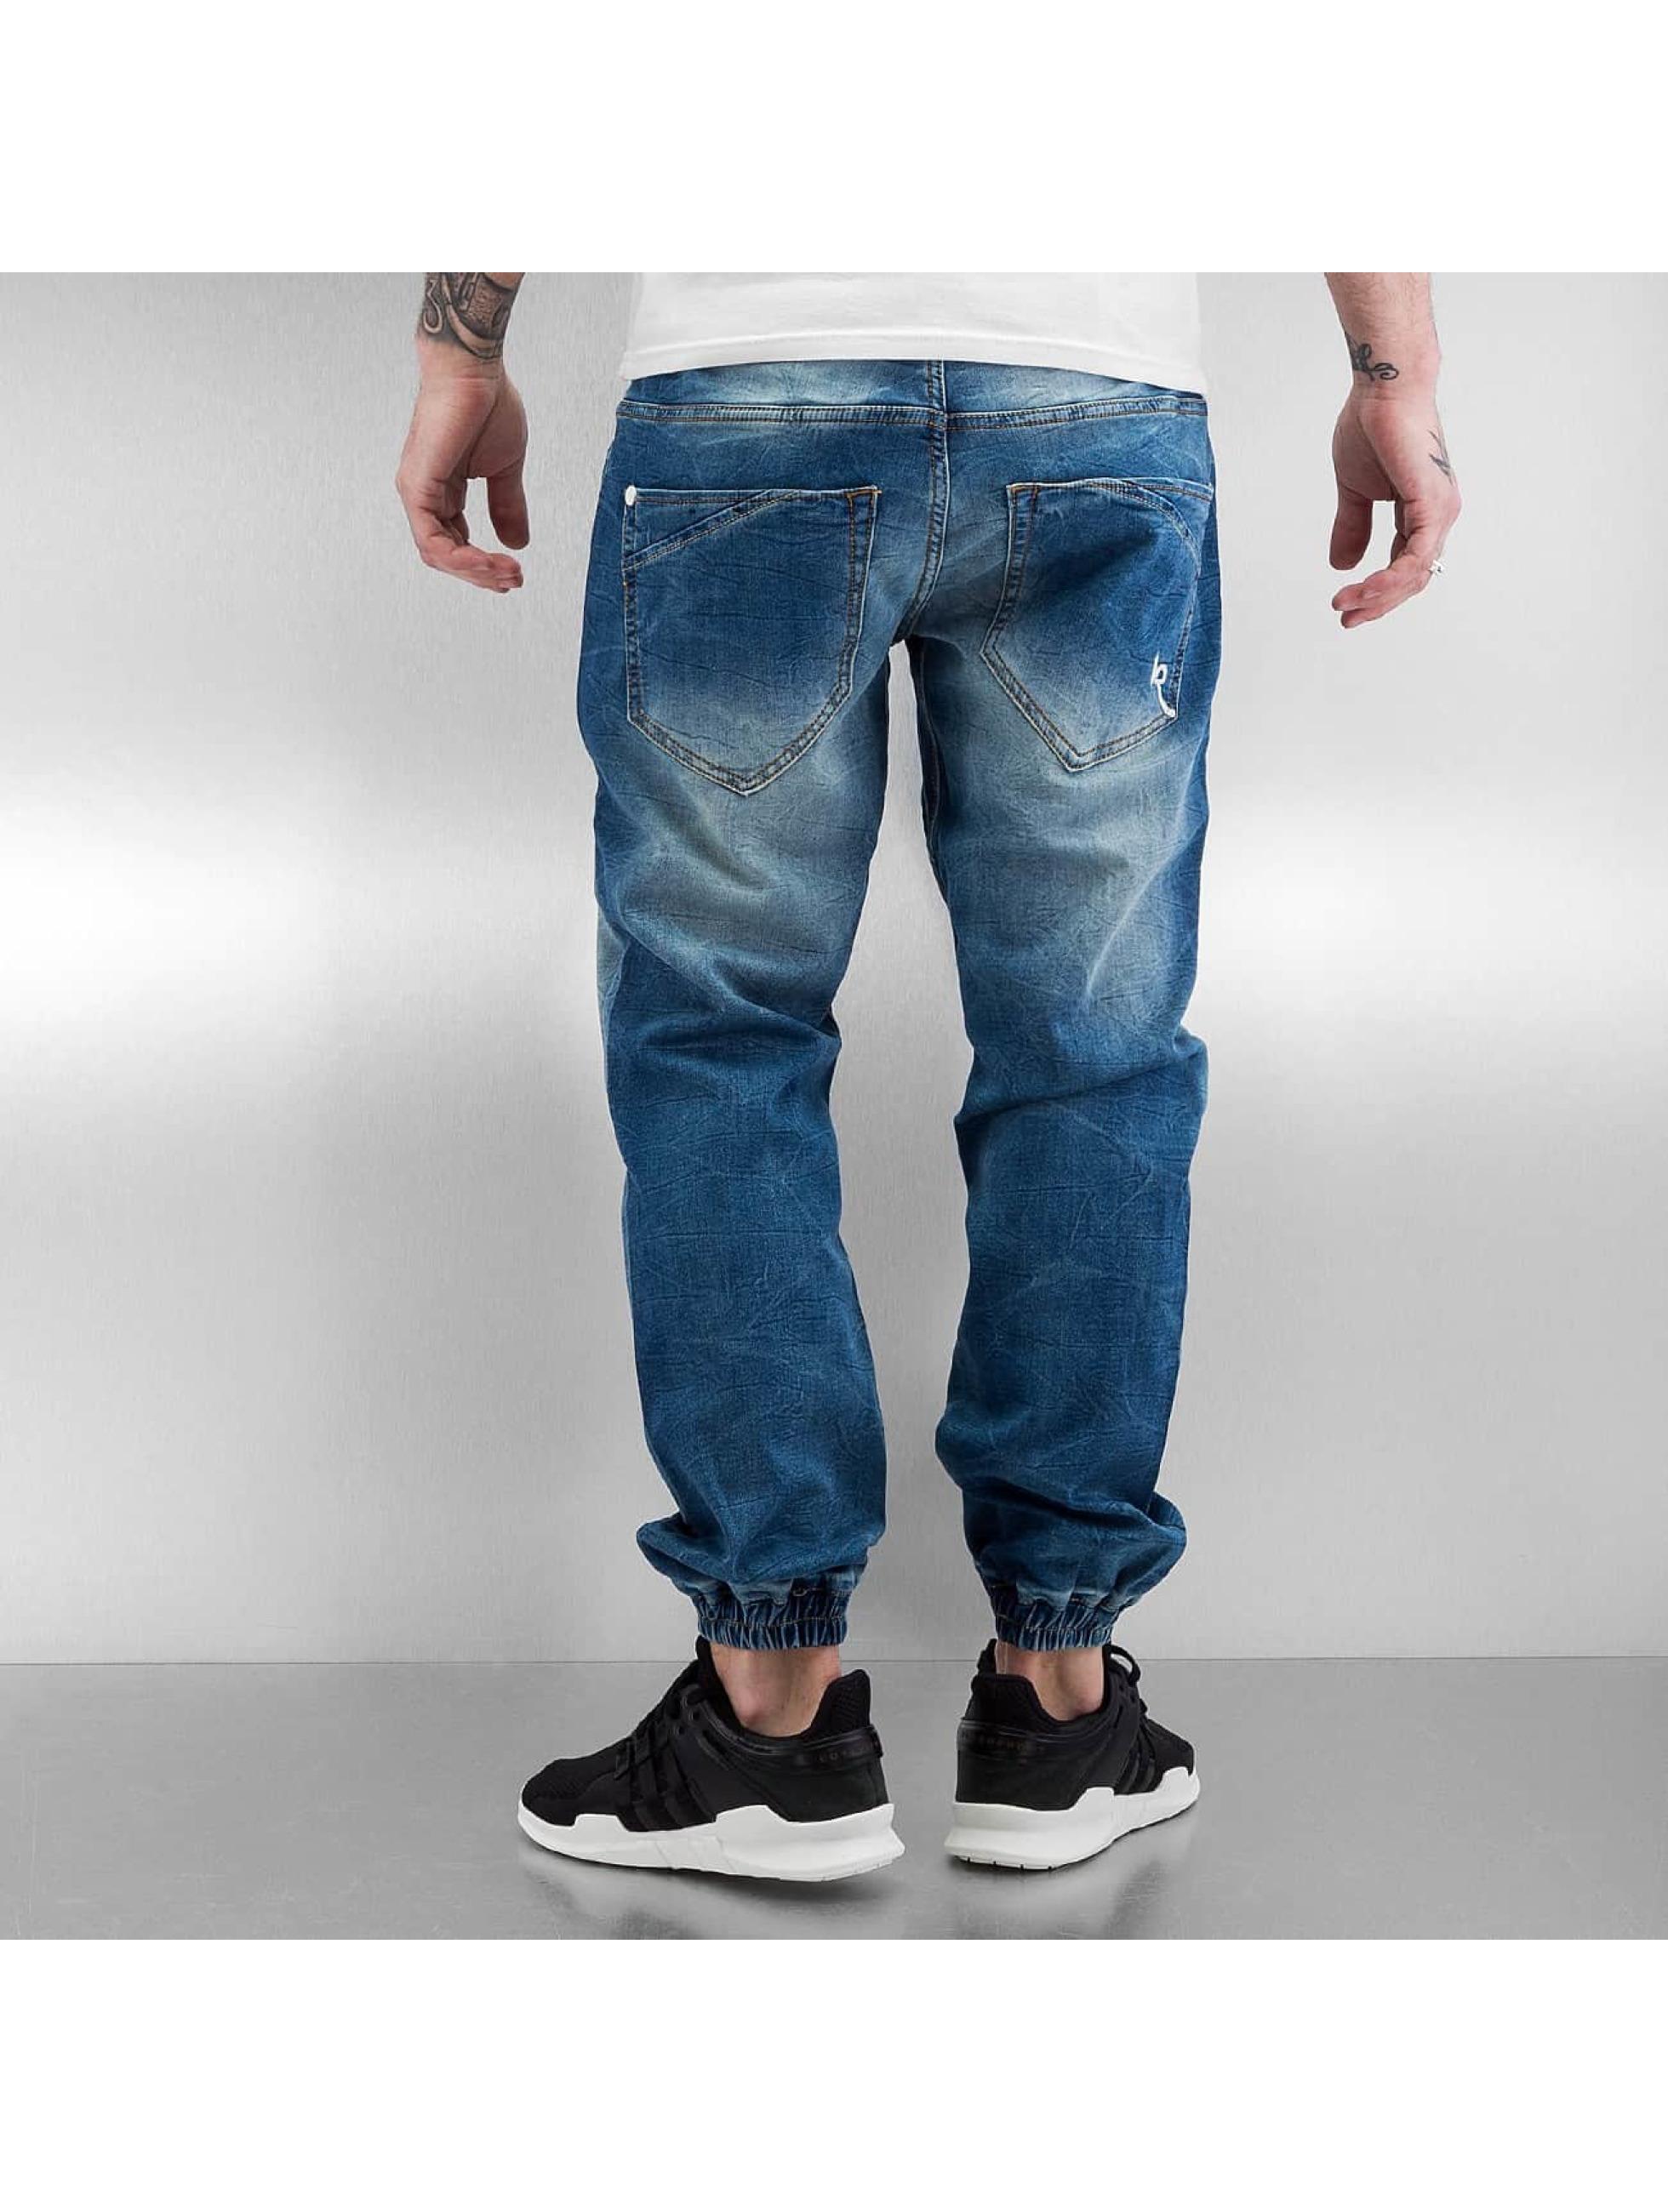 Rocawear Antifit Jogger blue